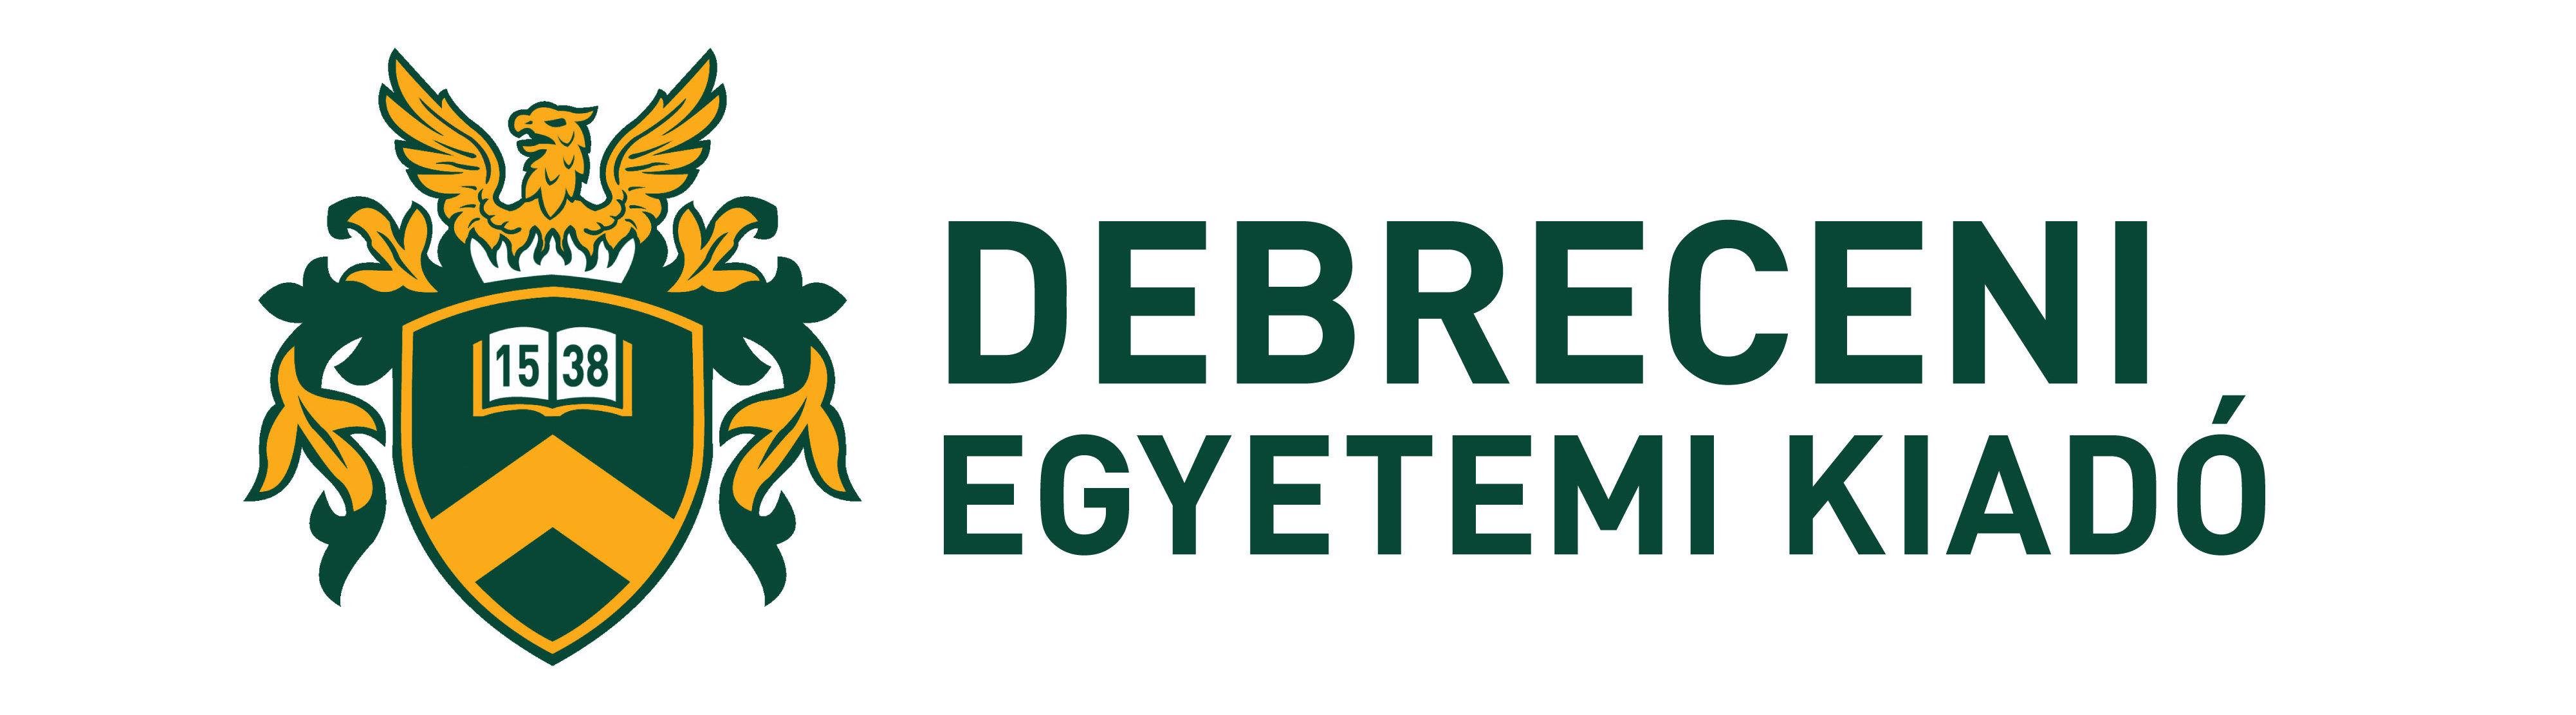 Debreceni Egyetemi Kiadó